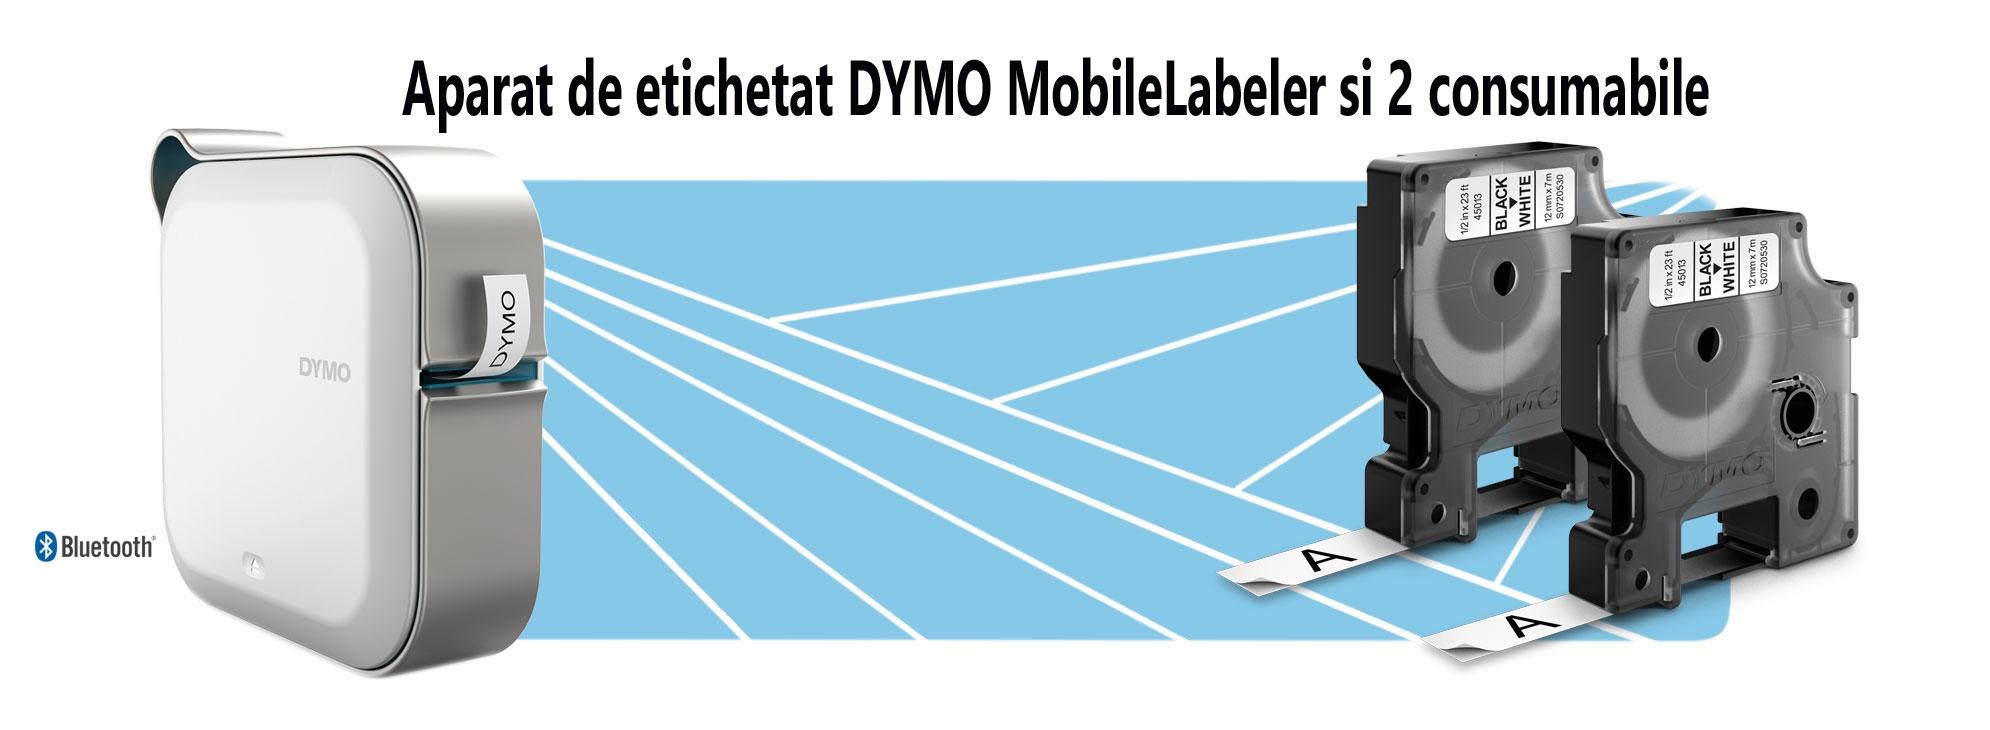 Aparat de etichetat DYMO MobileLabeler si 2 consumabile